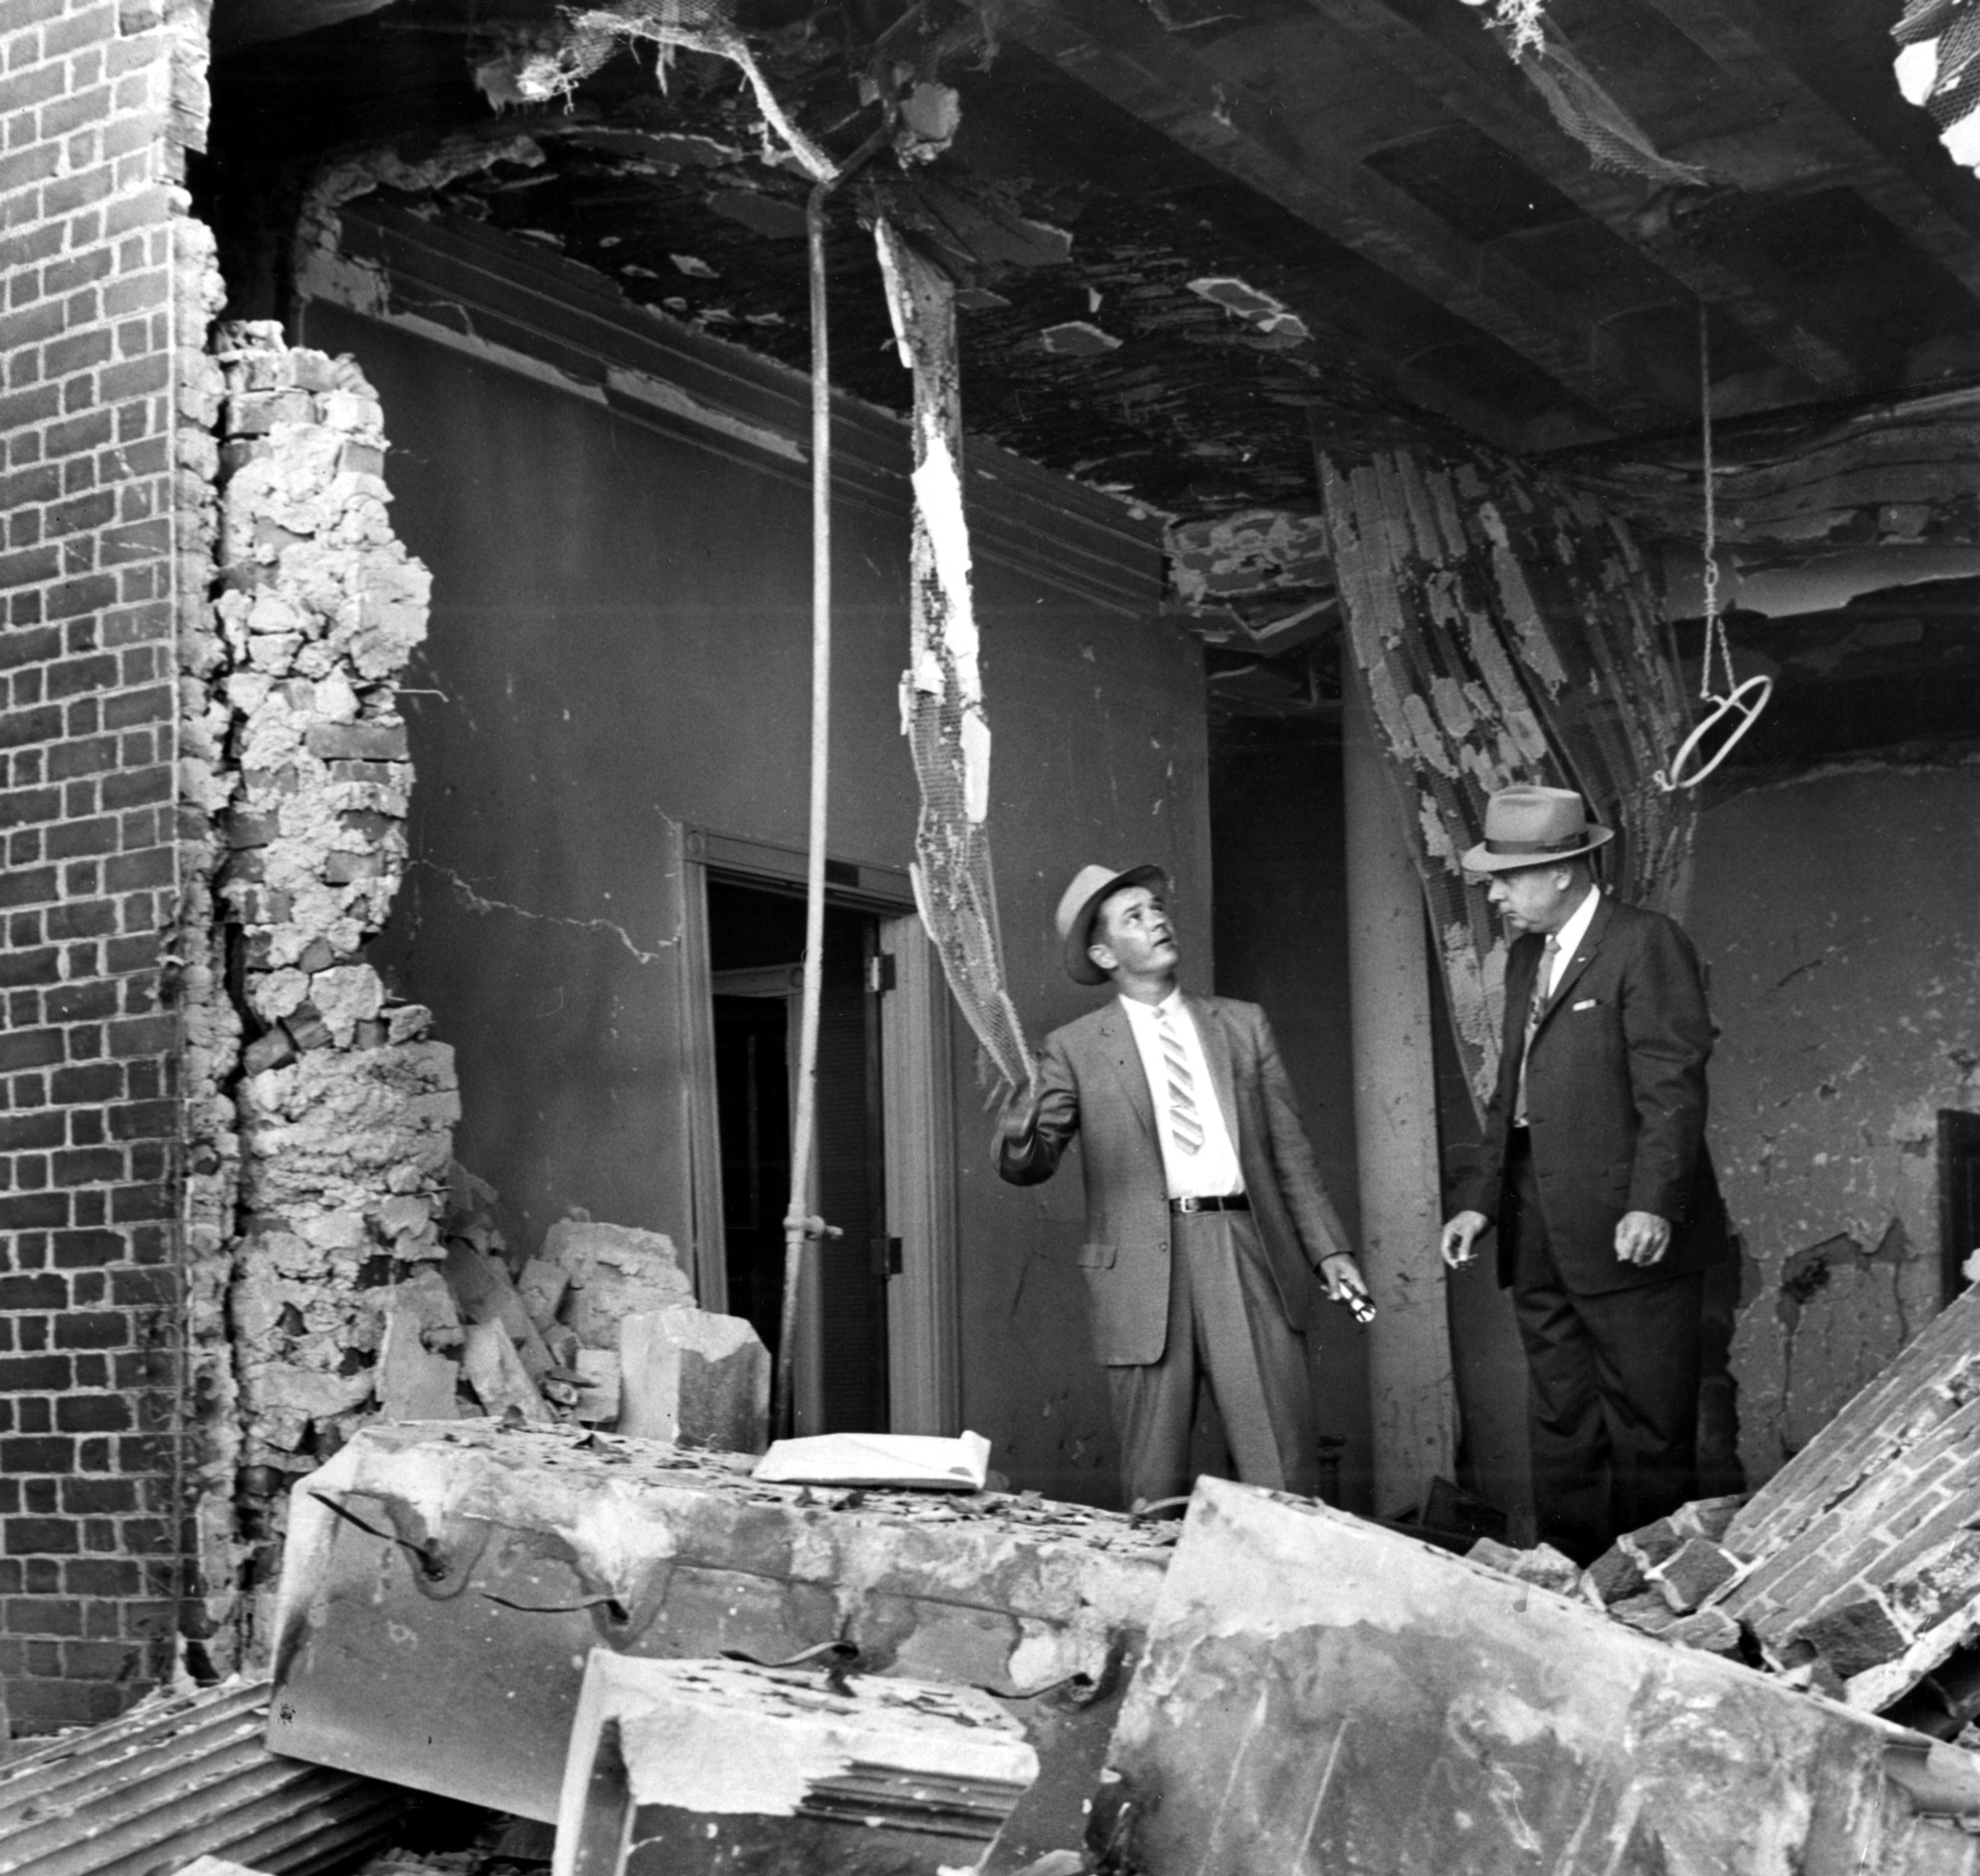 Atlanta Police examine the destruction of the Temple bombing in Atlanta in October 1958.